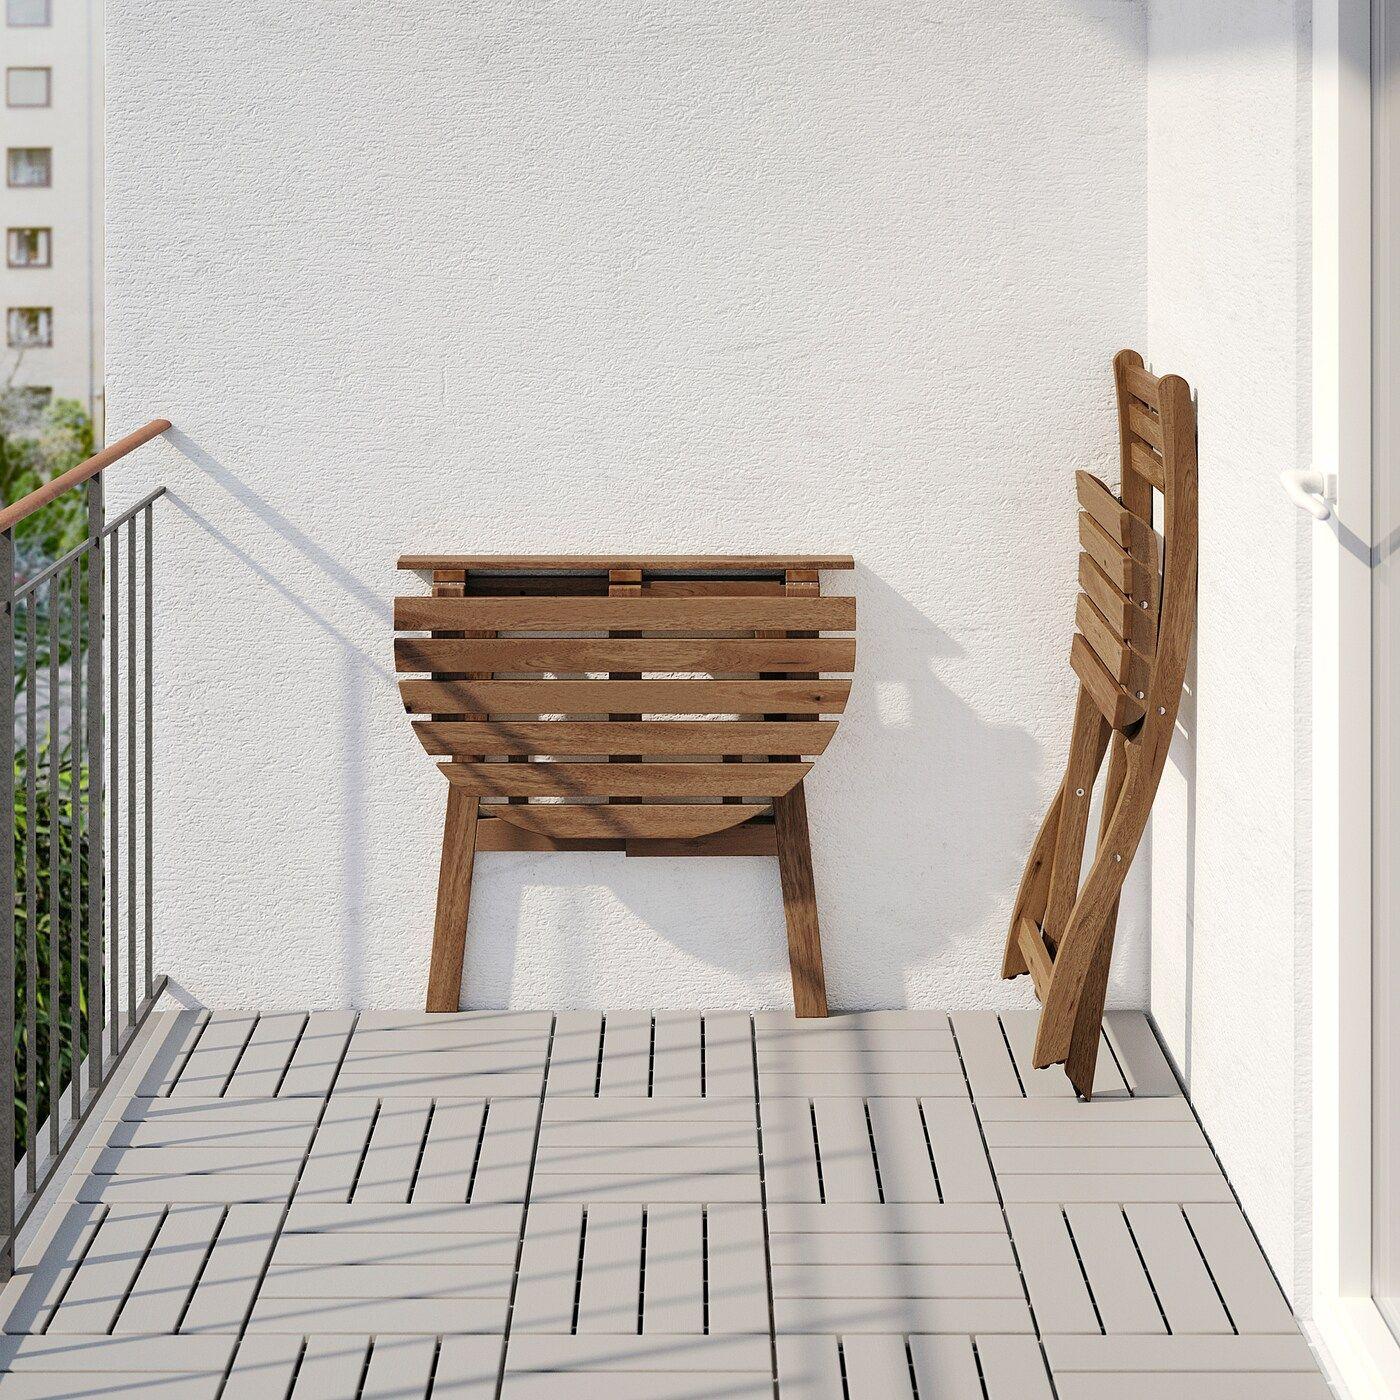 Askholmen Wandtisch Klappstuhl Aussen Graubraun Lasiert